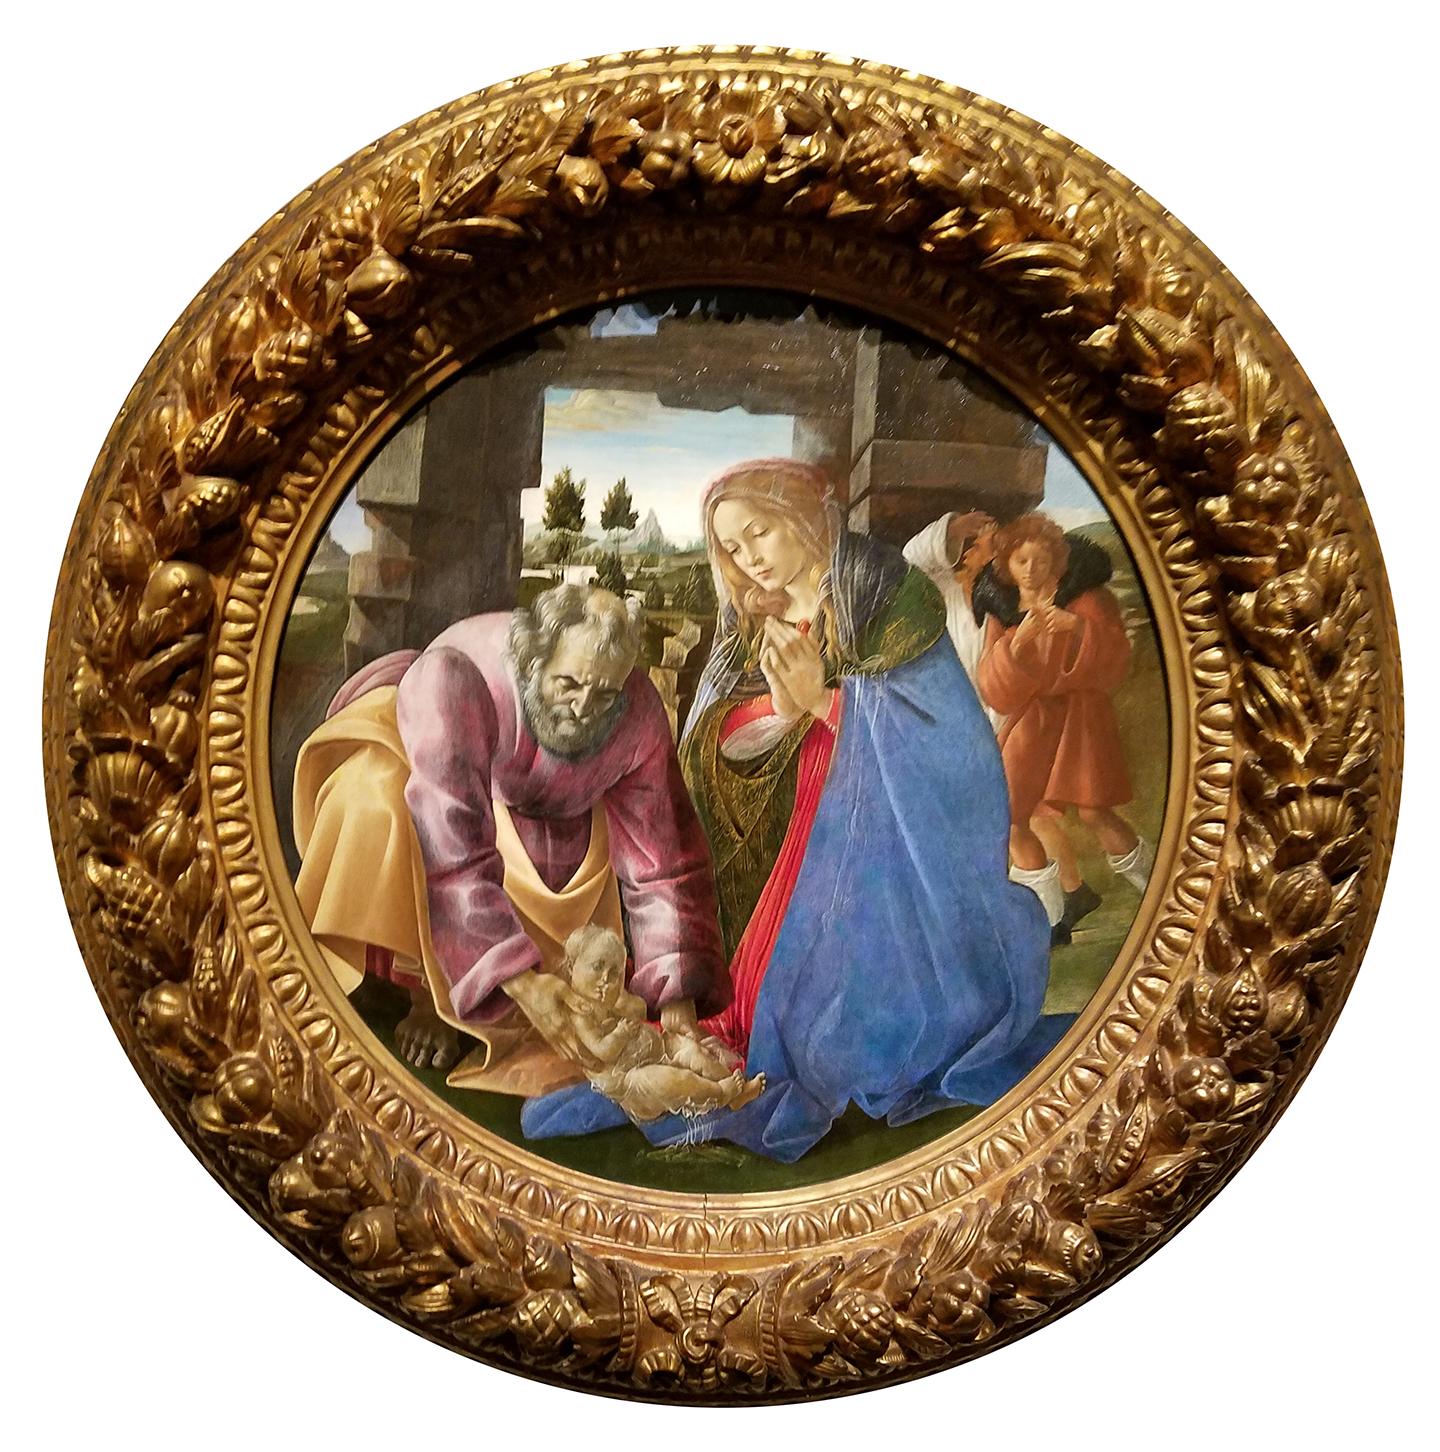 Botticelli - The Nativity, 1482-85